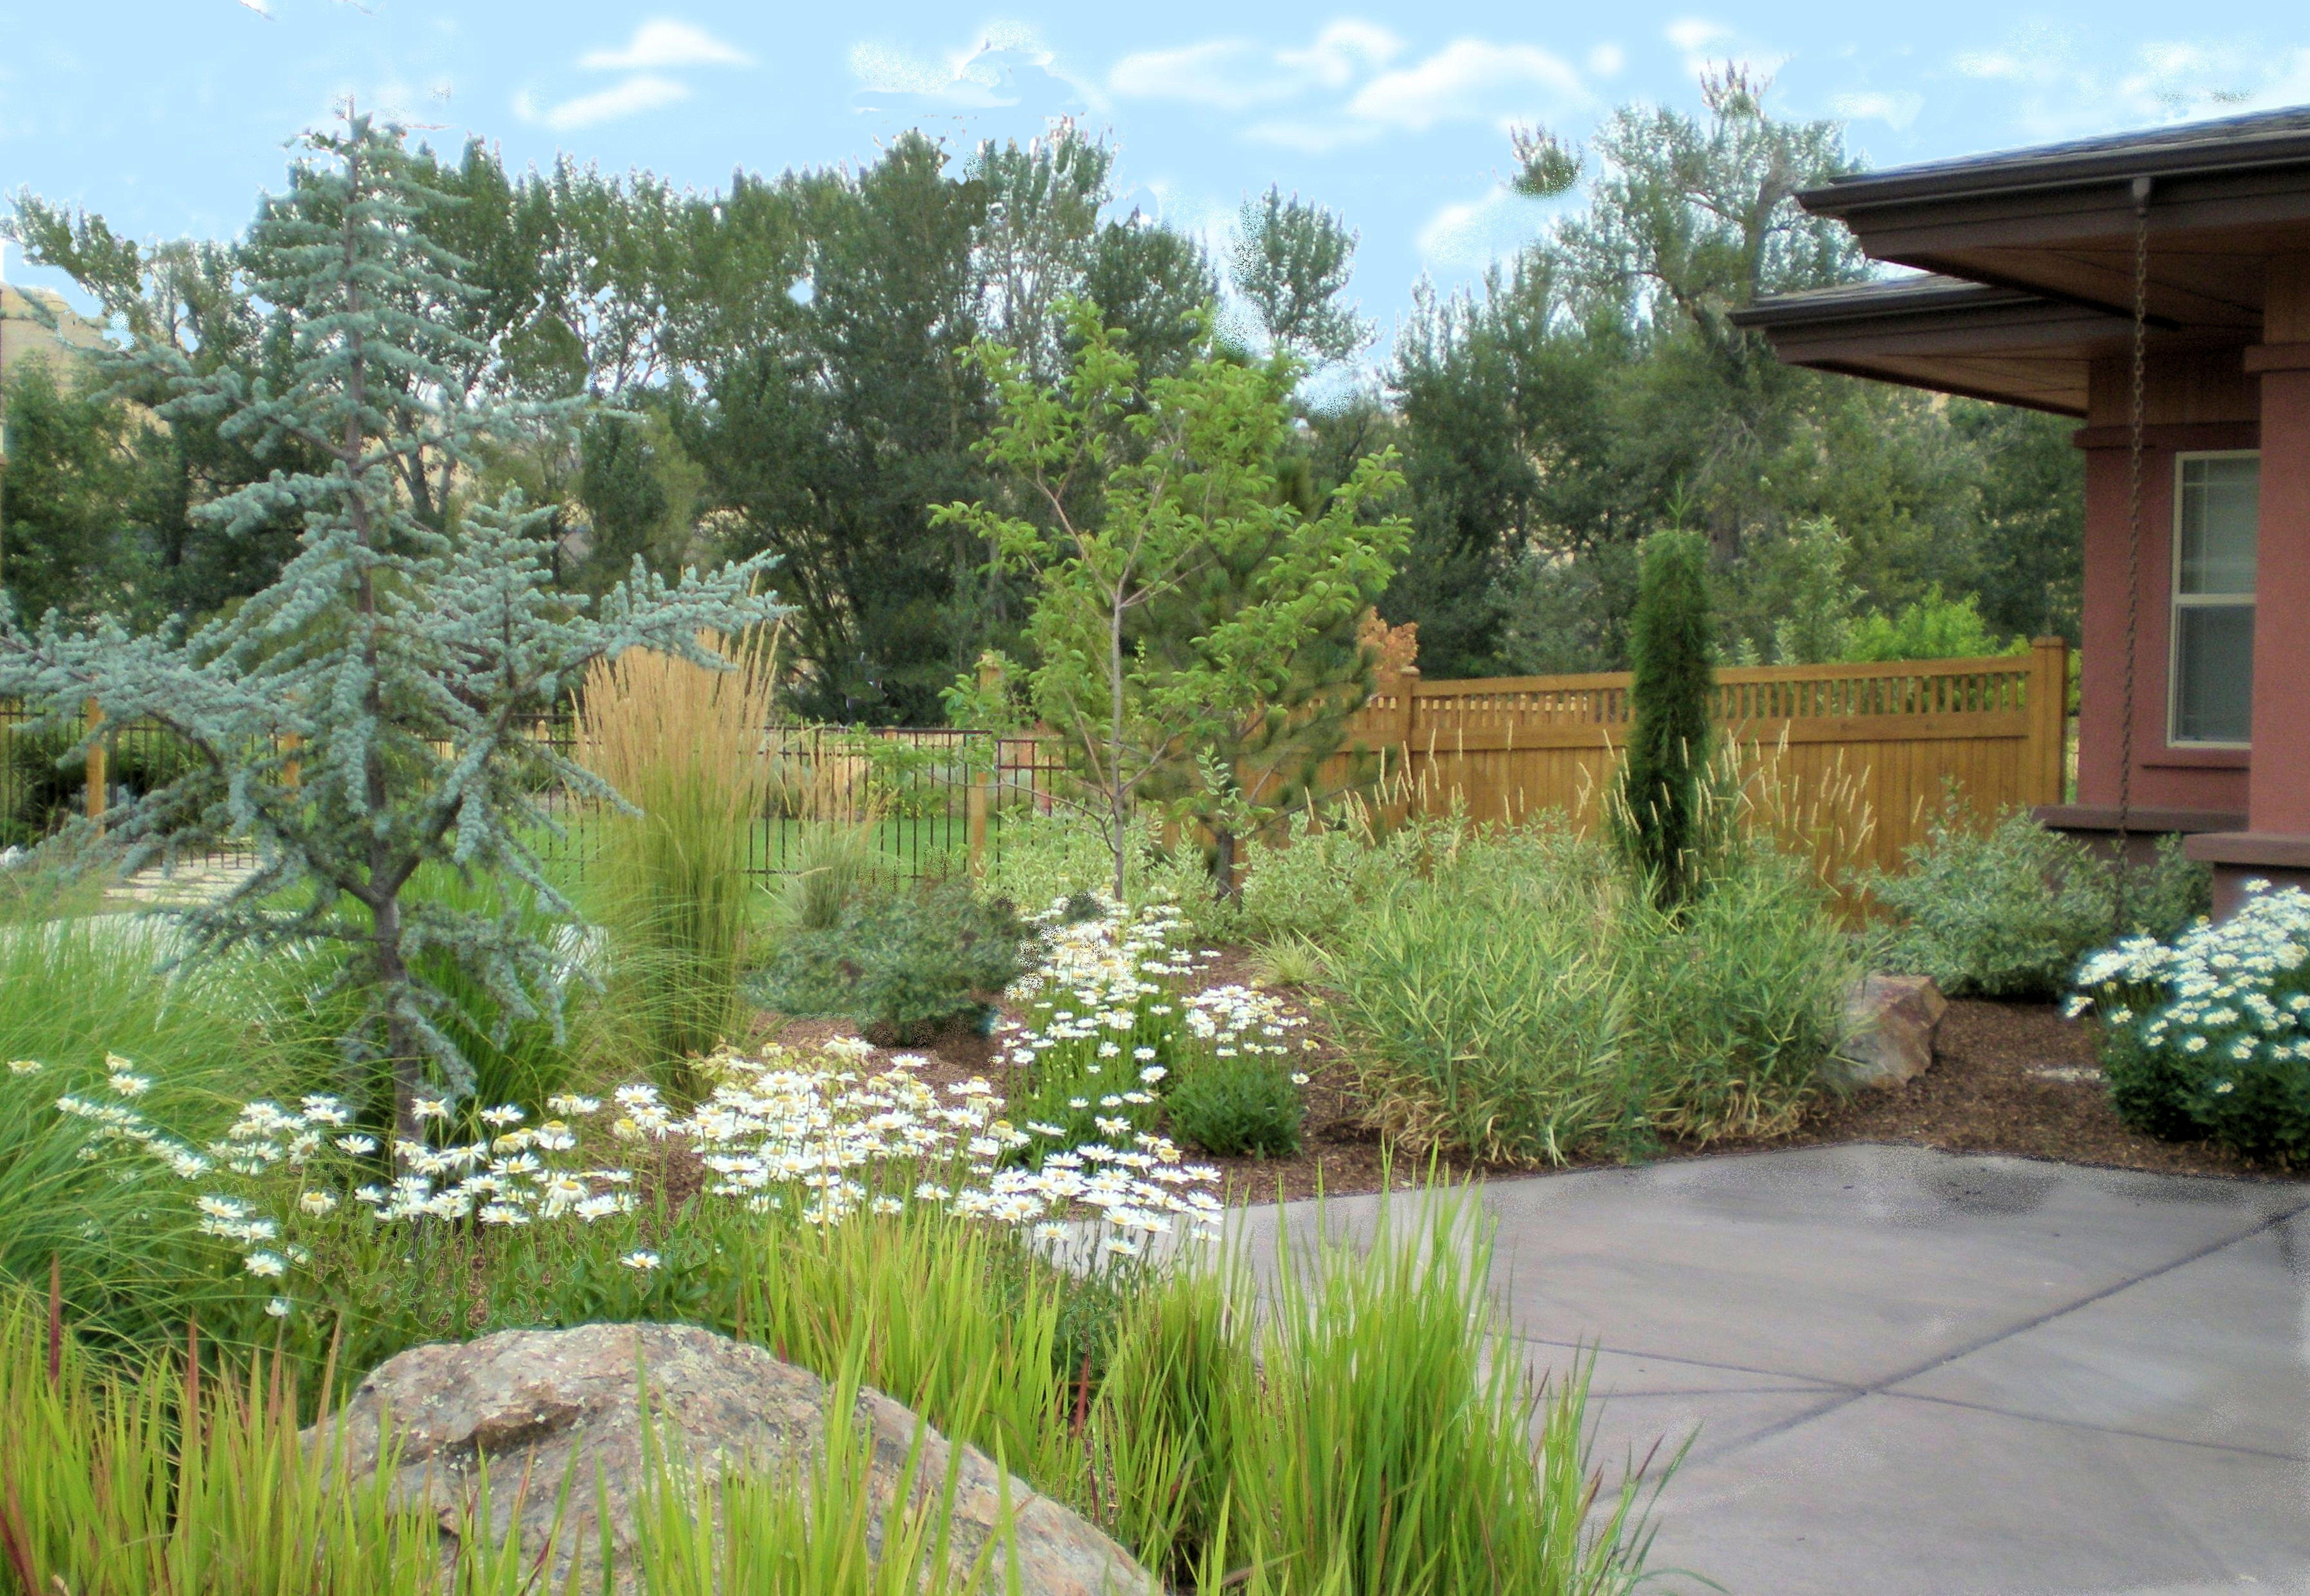 Boise Landscape Design And Build Landscape Design Front Yard Lawn And Garden